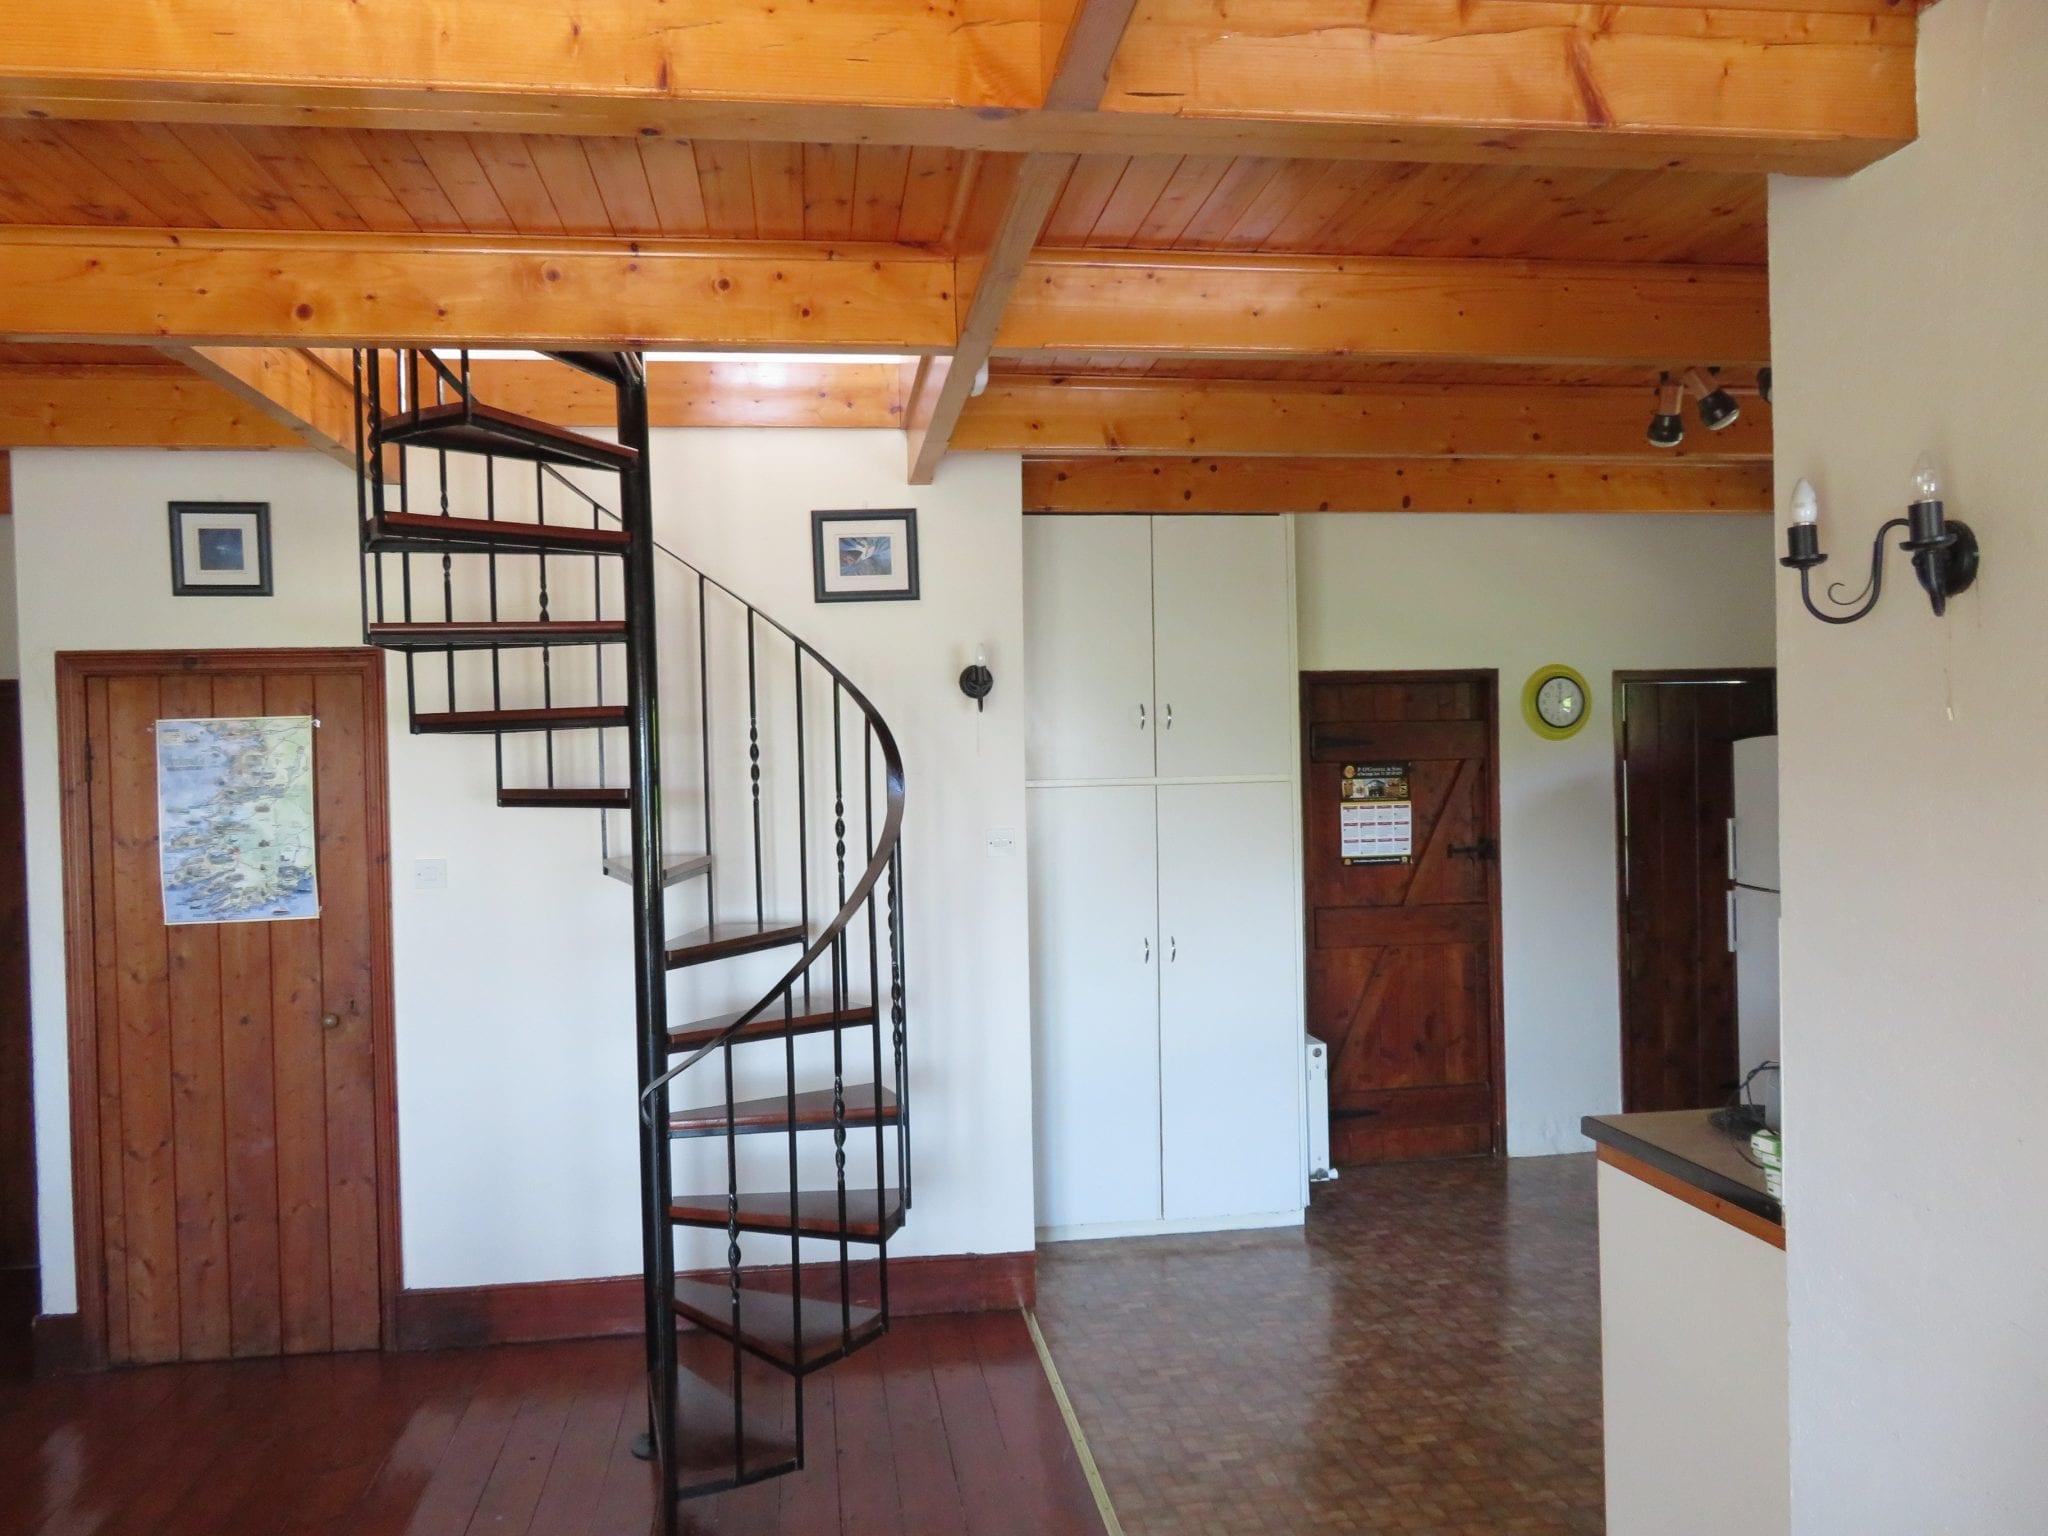 9. IMG_0014 - stairs